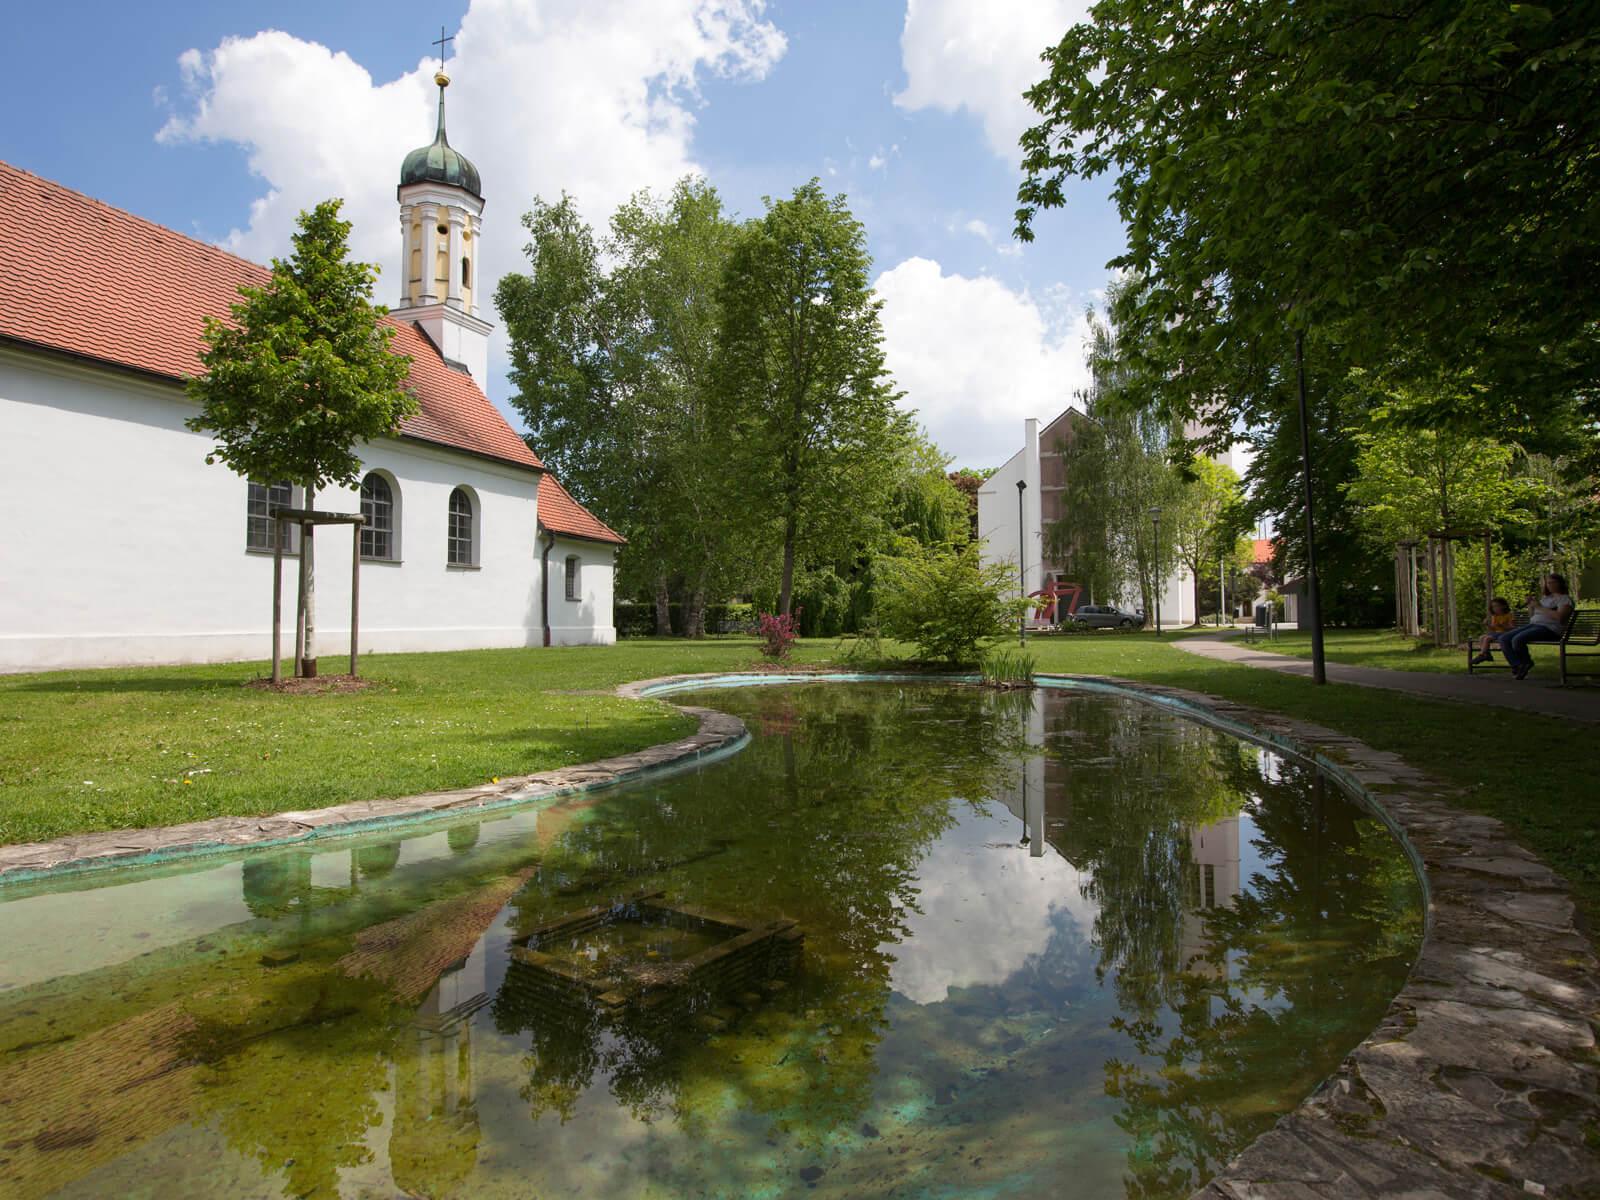 Ägidiuskapelle im Ägidiuspark. Foto: Ulrike Klumpp